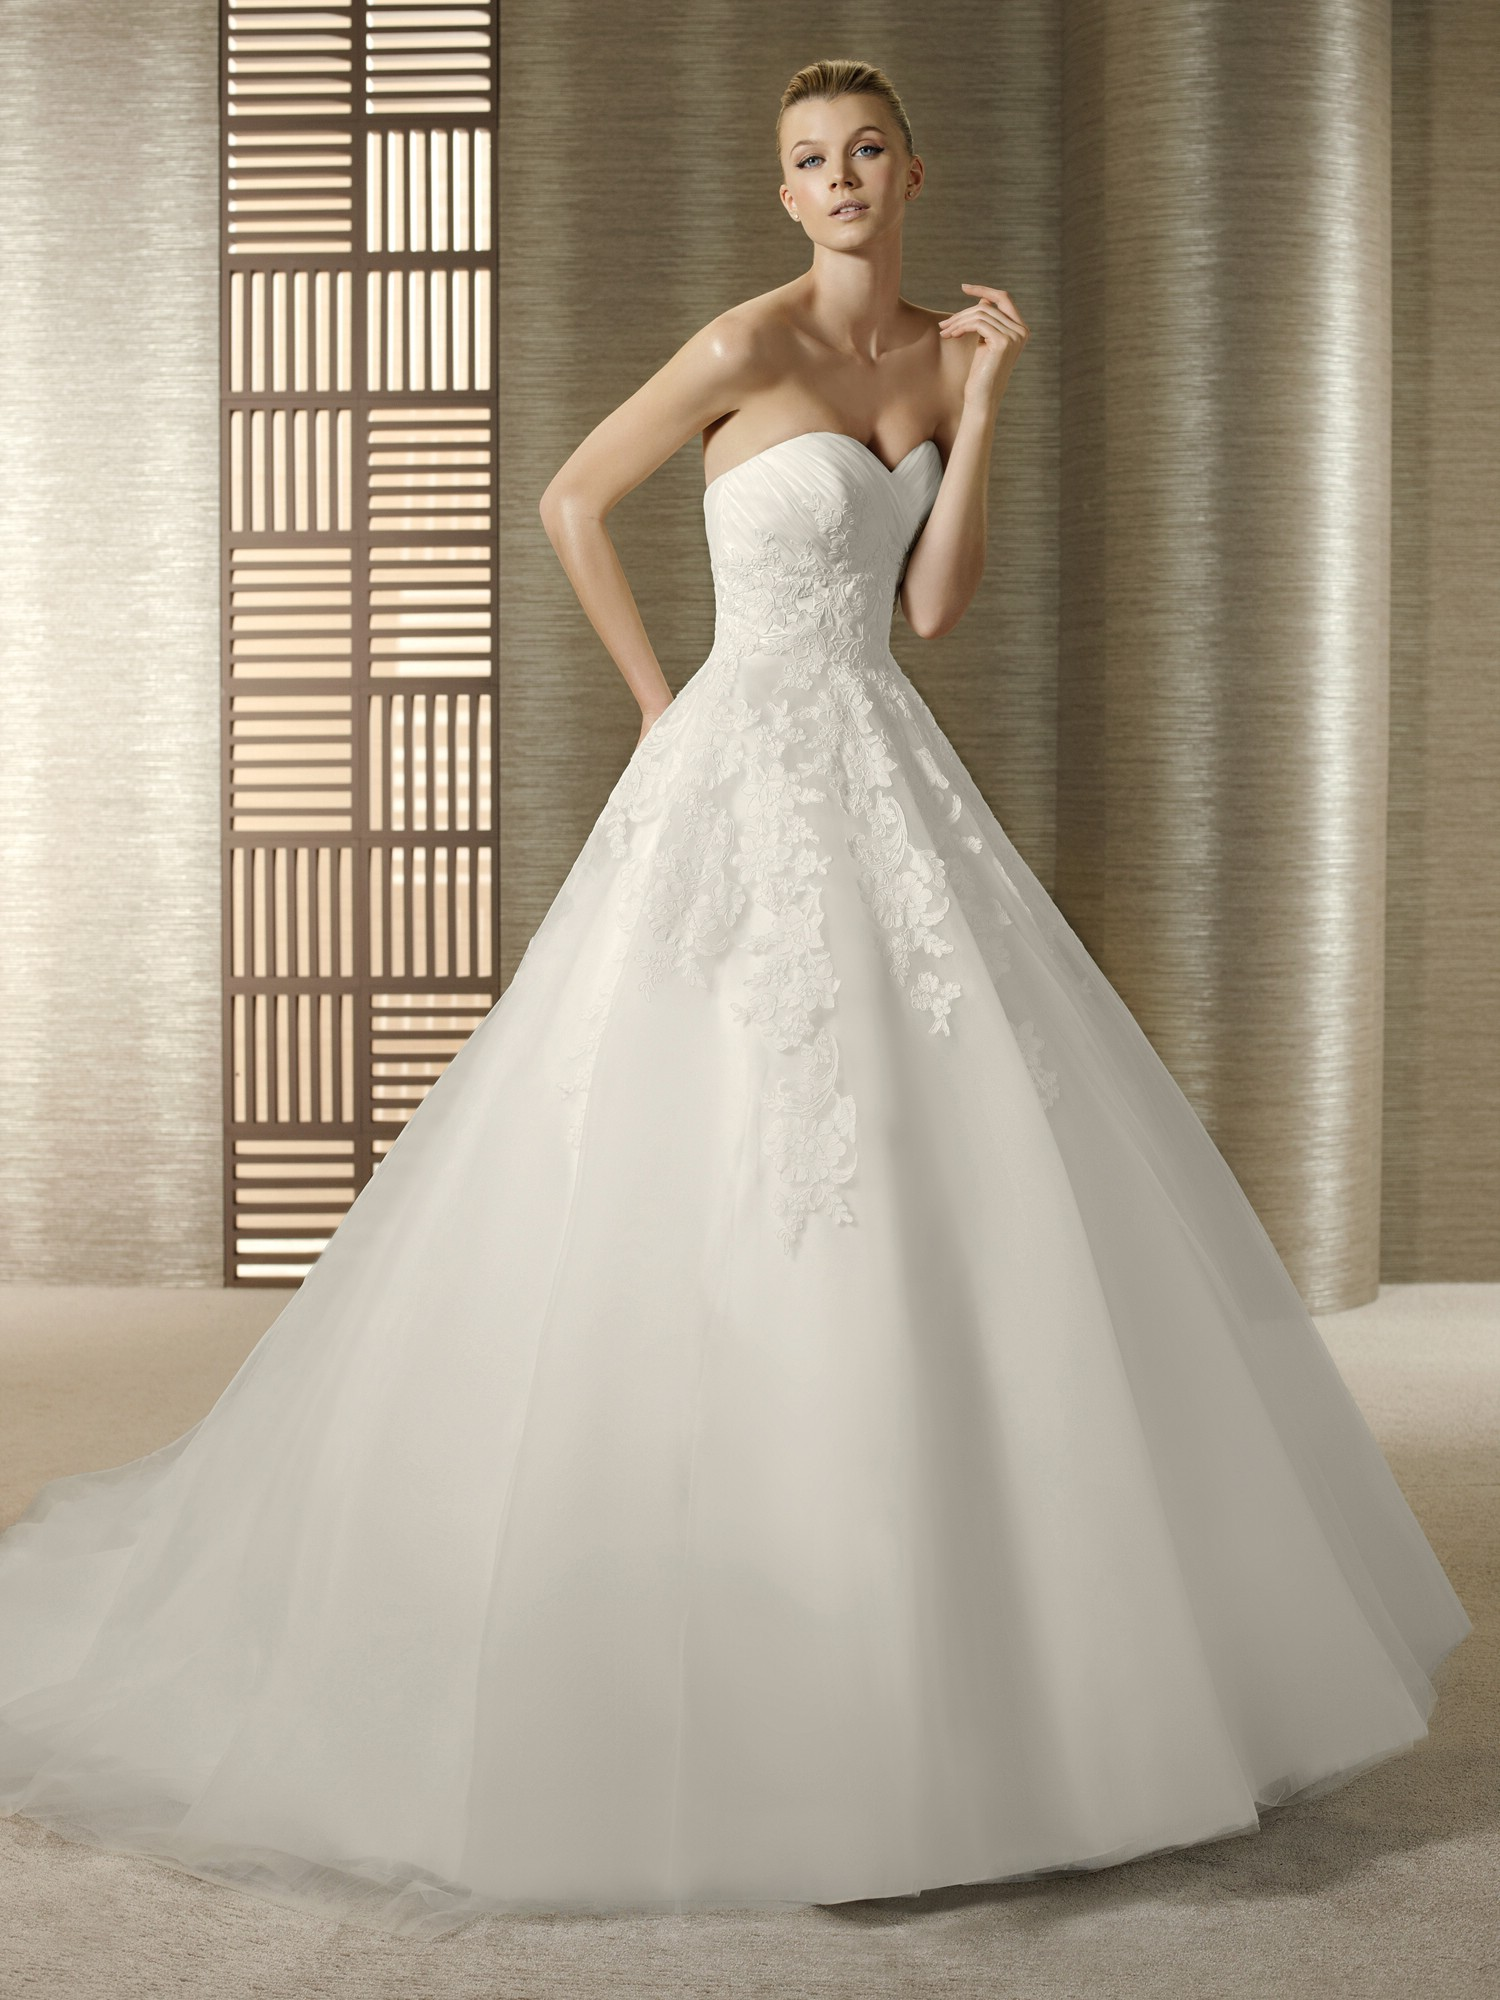 white one wedding dresses photo - 1